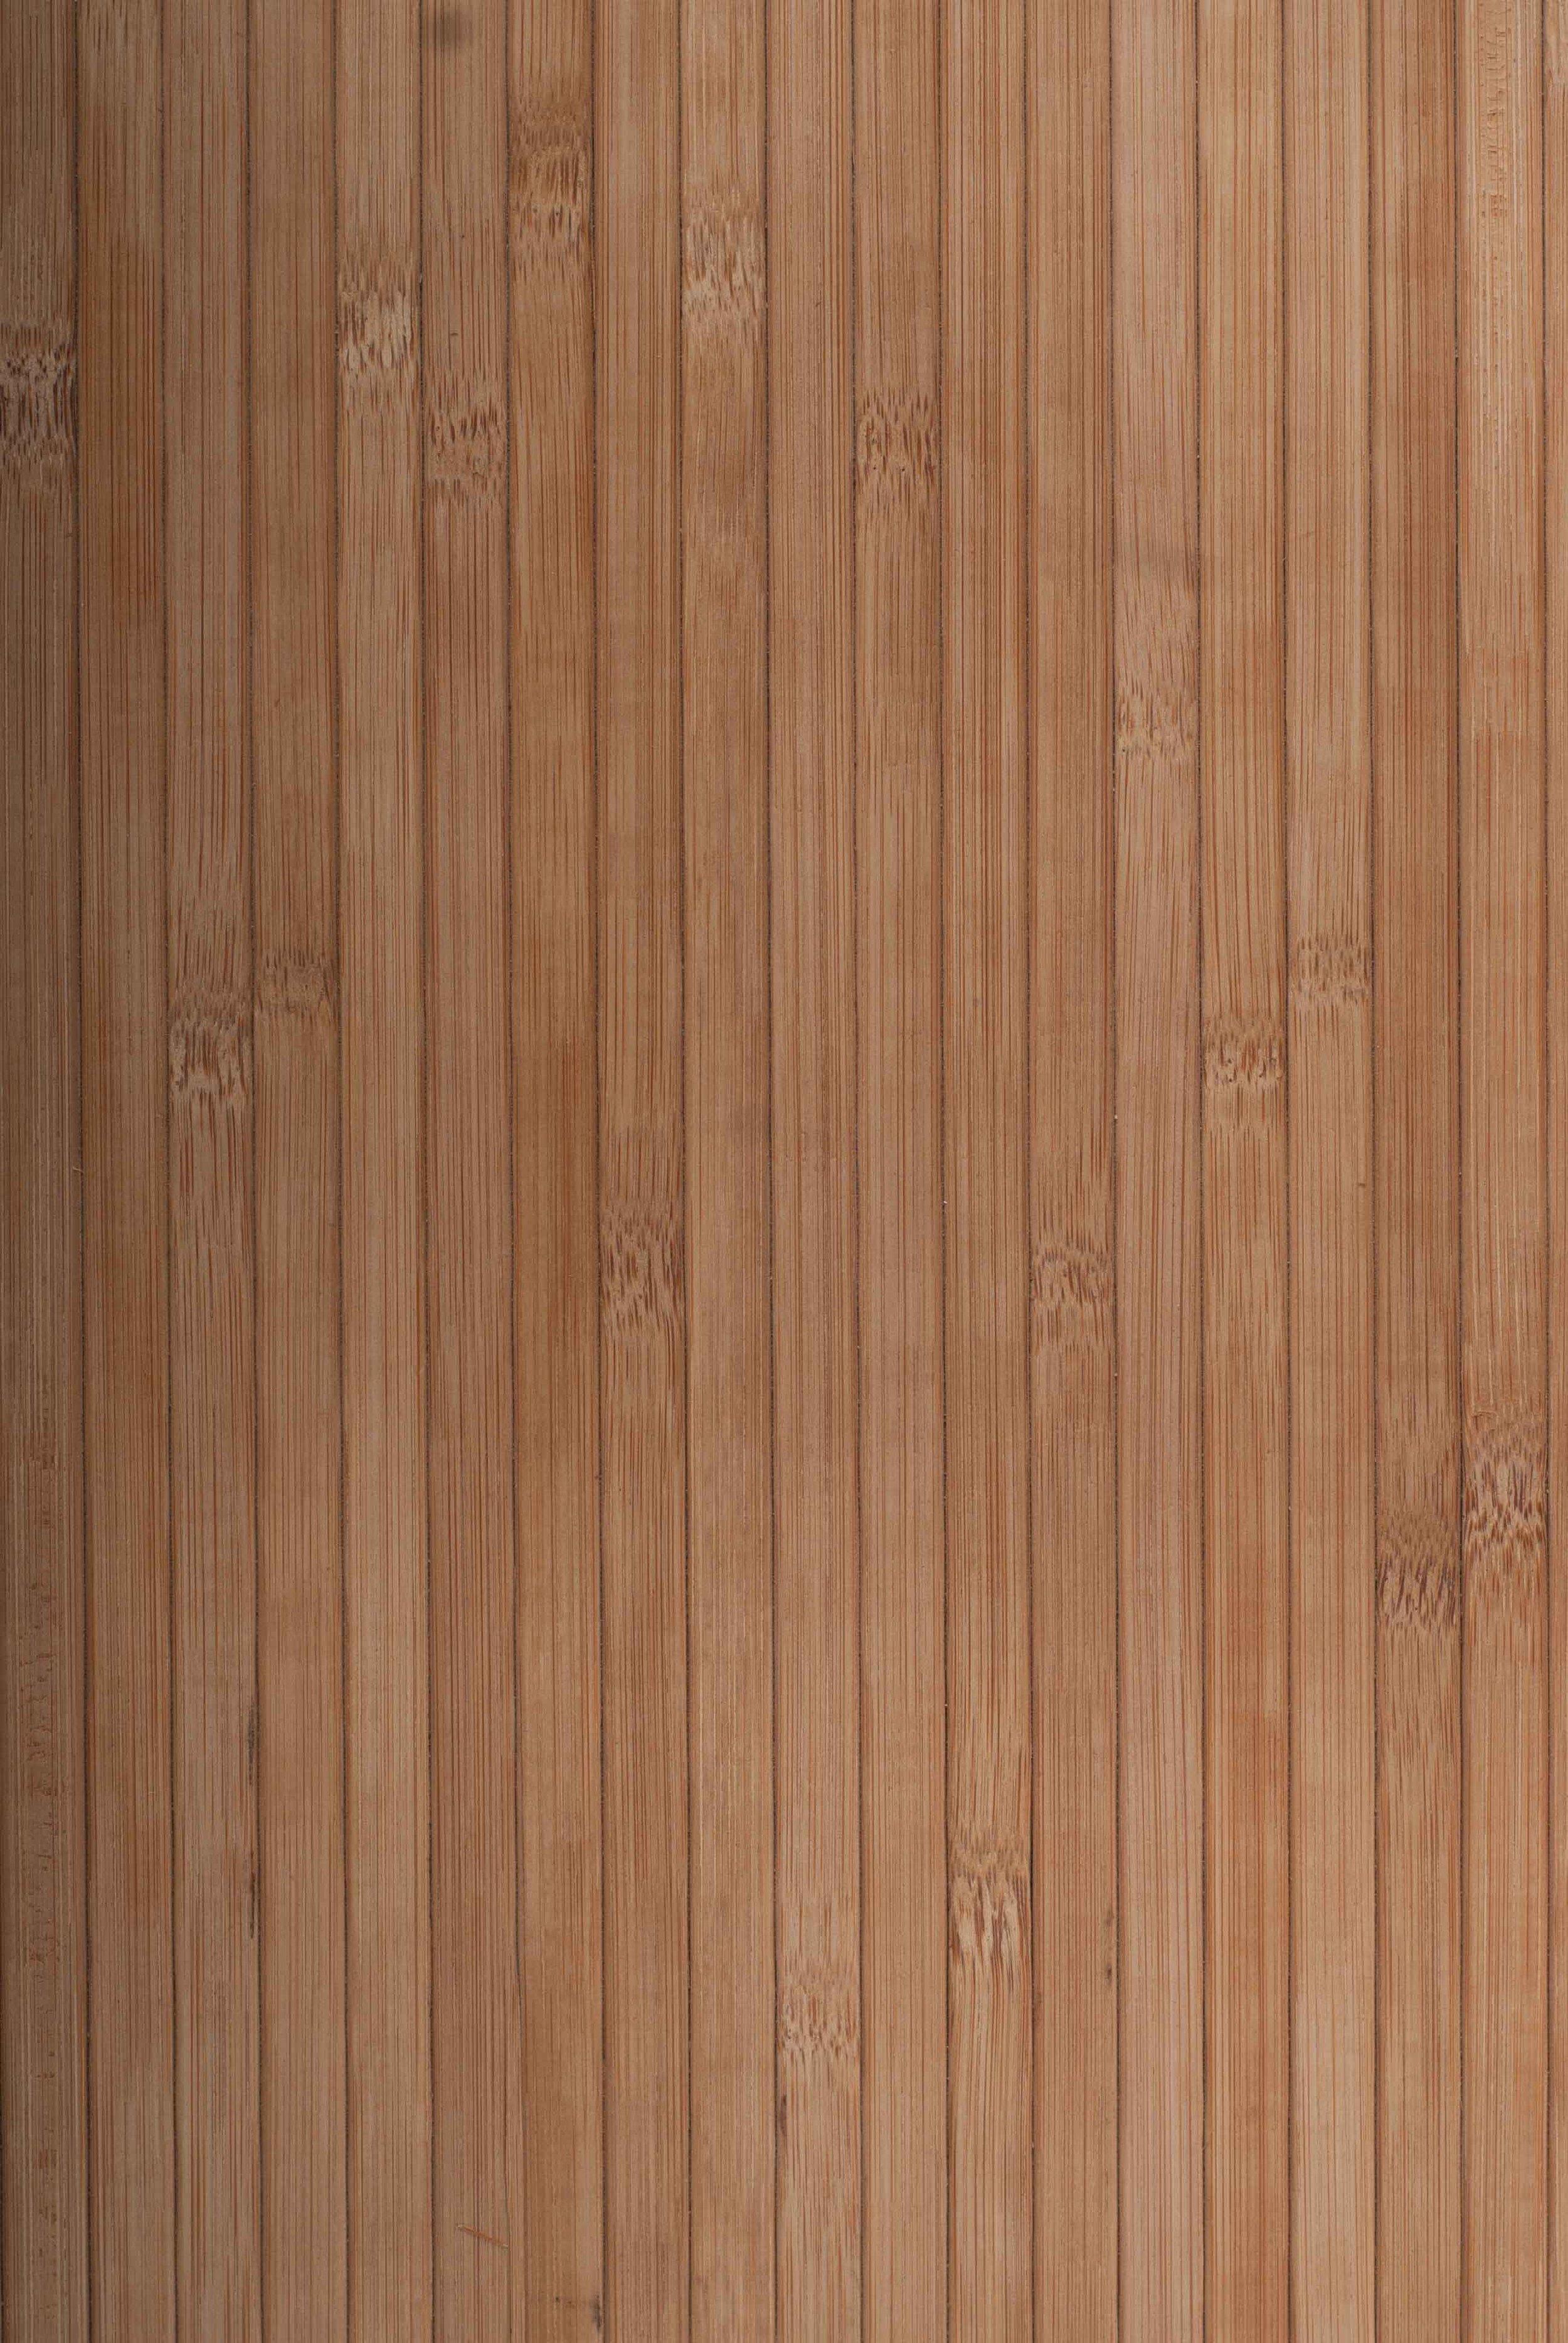 Bamboo Cladding Brightfields Natural Trading Company